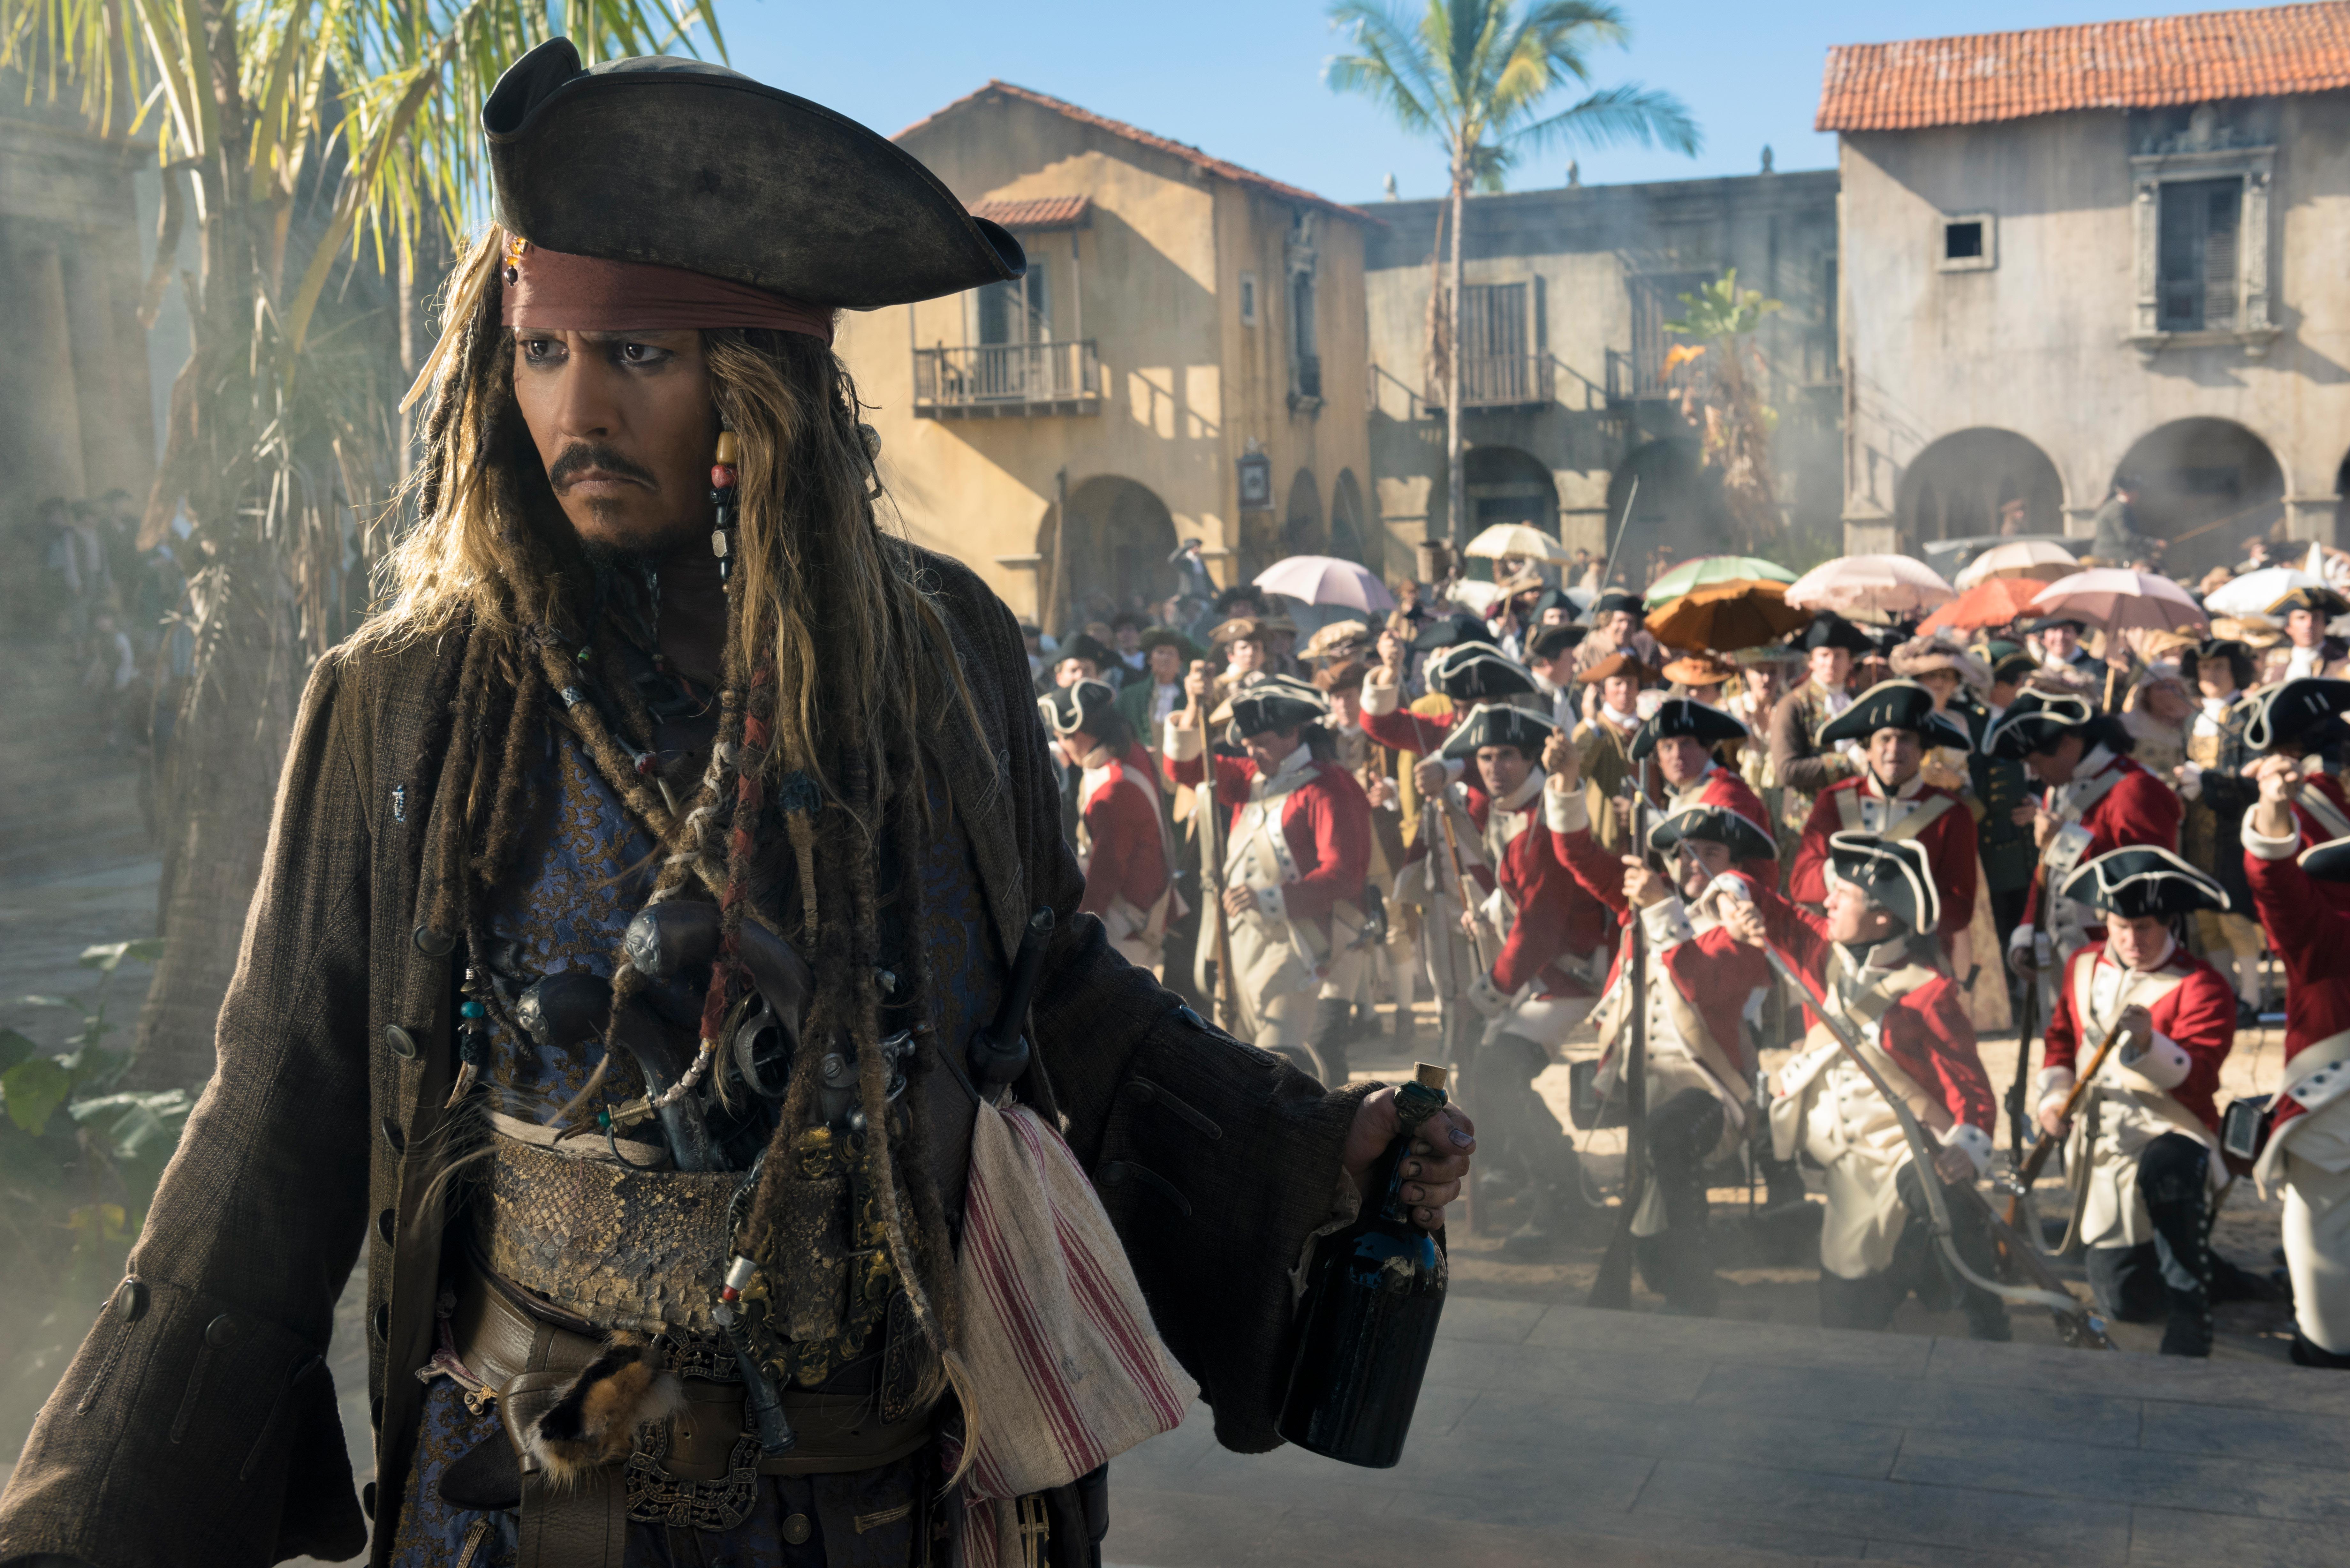 Dead Men Tell No Tales Wallpaper: Johnny Depp Pirates Of The Caribbean Dead Men Tell No